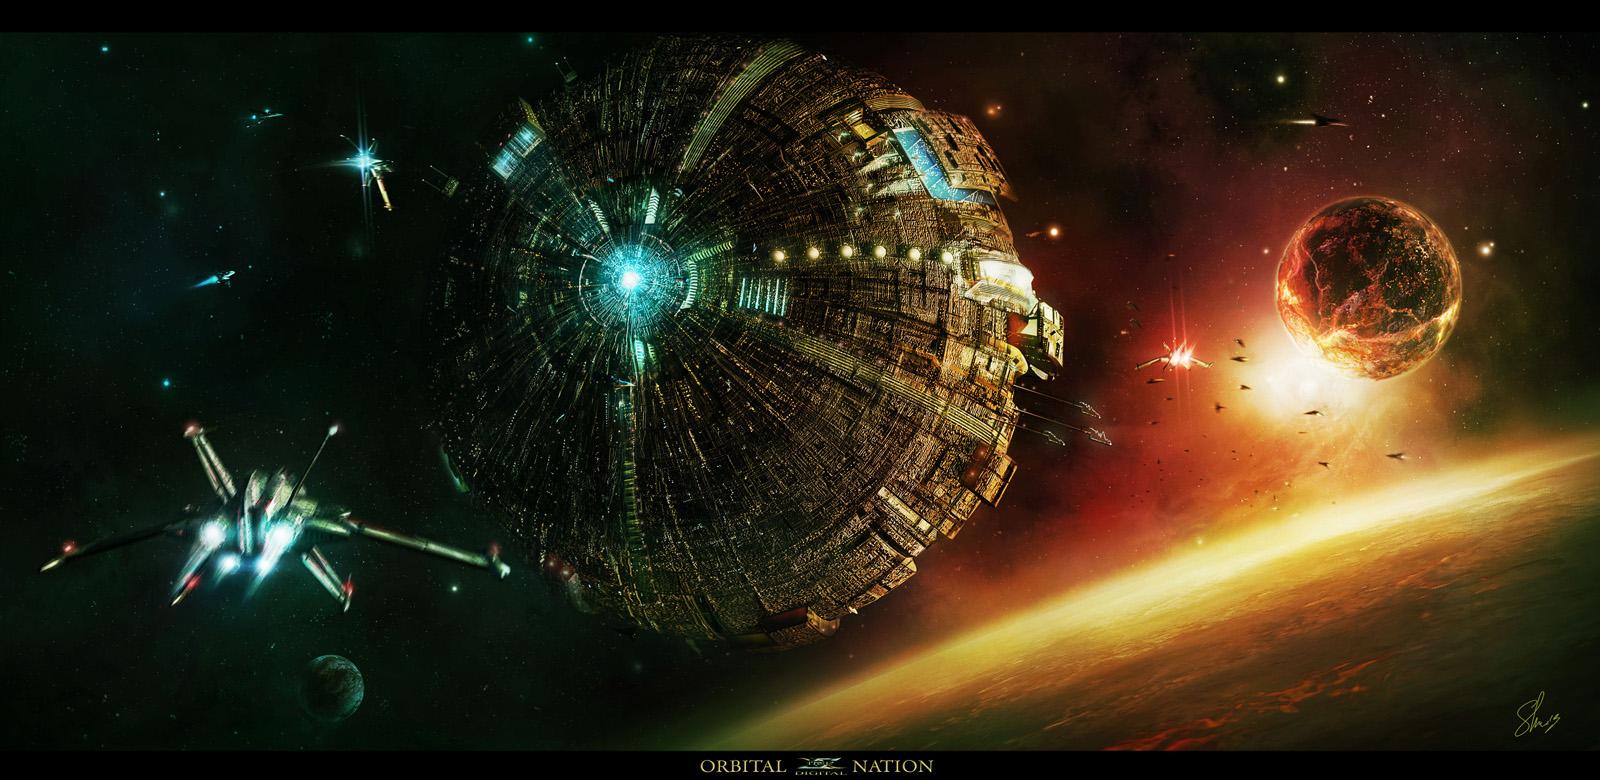 Orbital Nation by Shue13